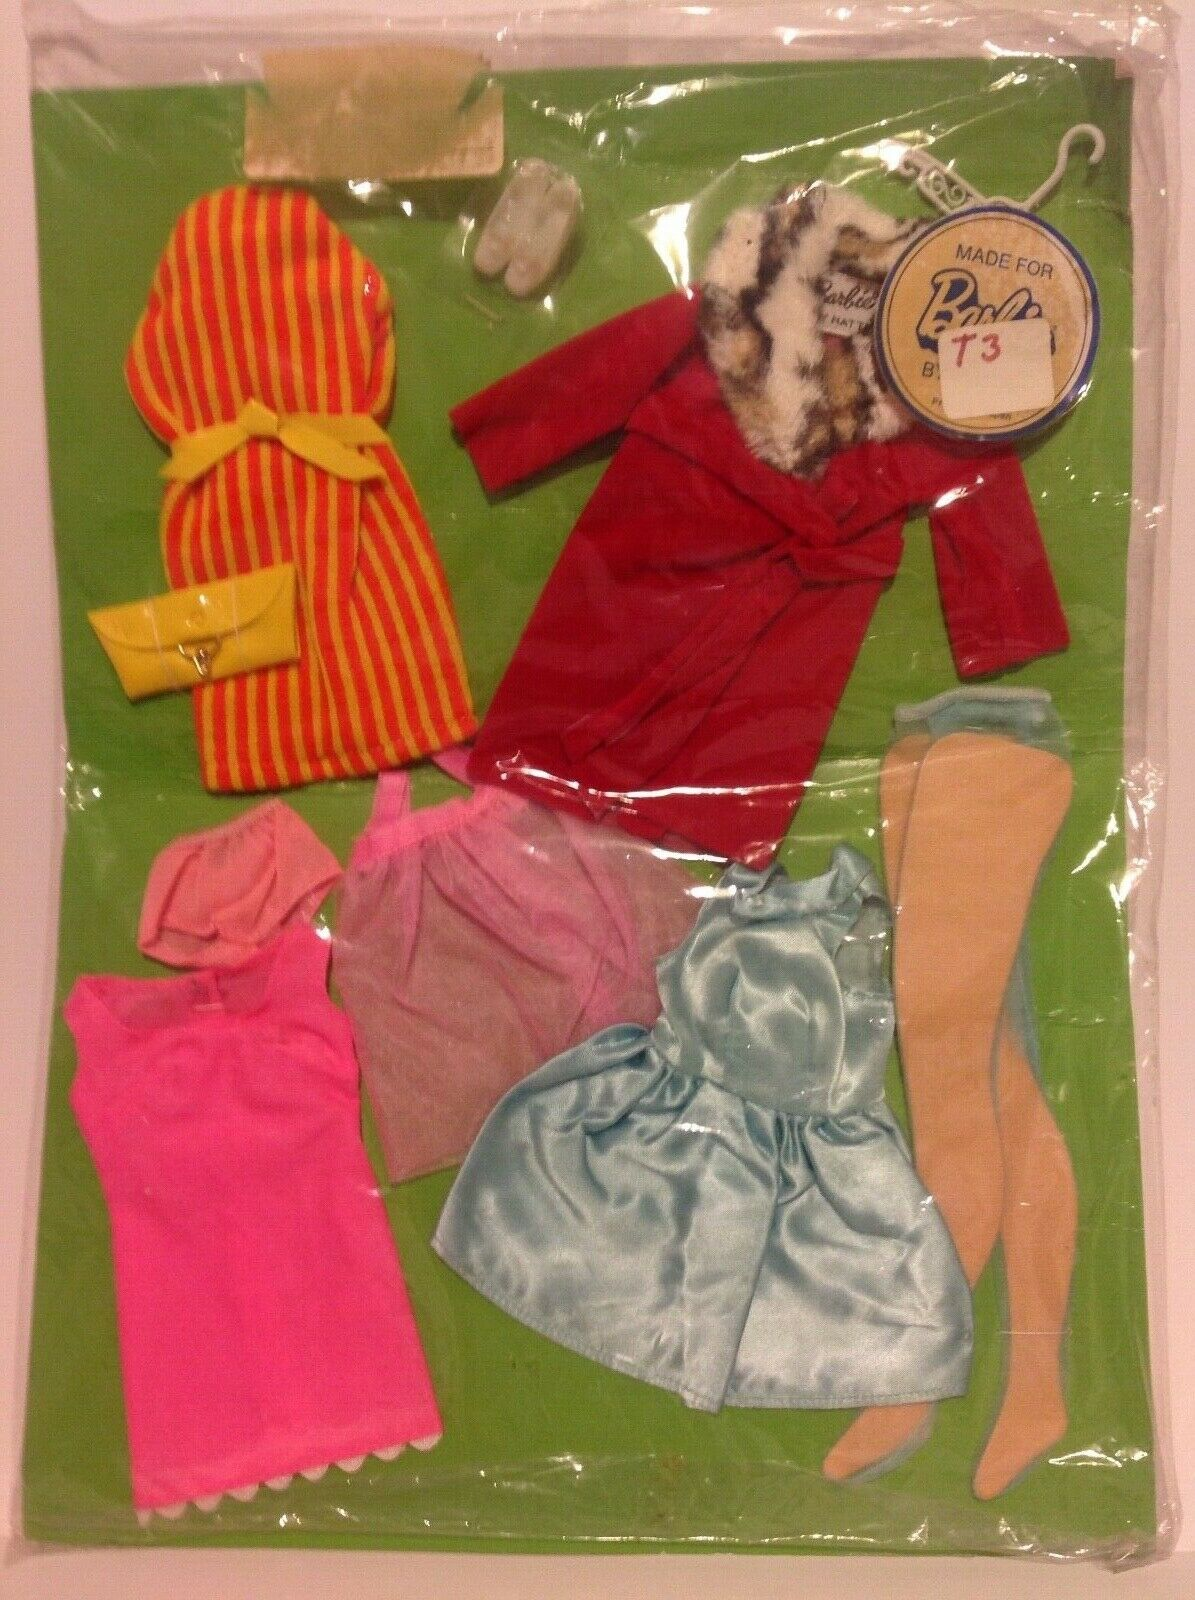 Glamour Vintage Barbie Sears exclusivo grupo ex Menta cosido en la tarjeta